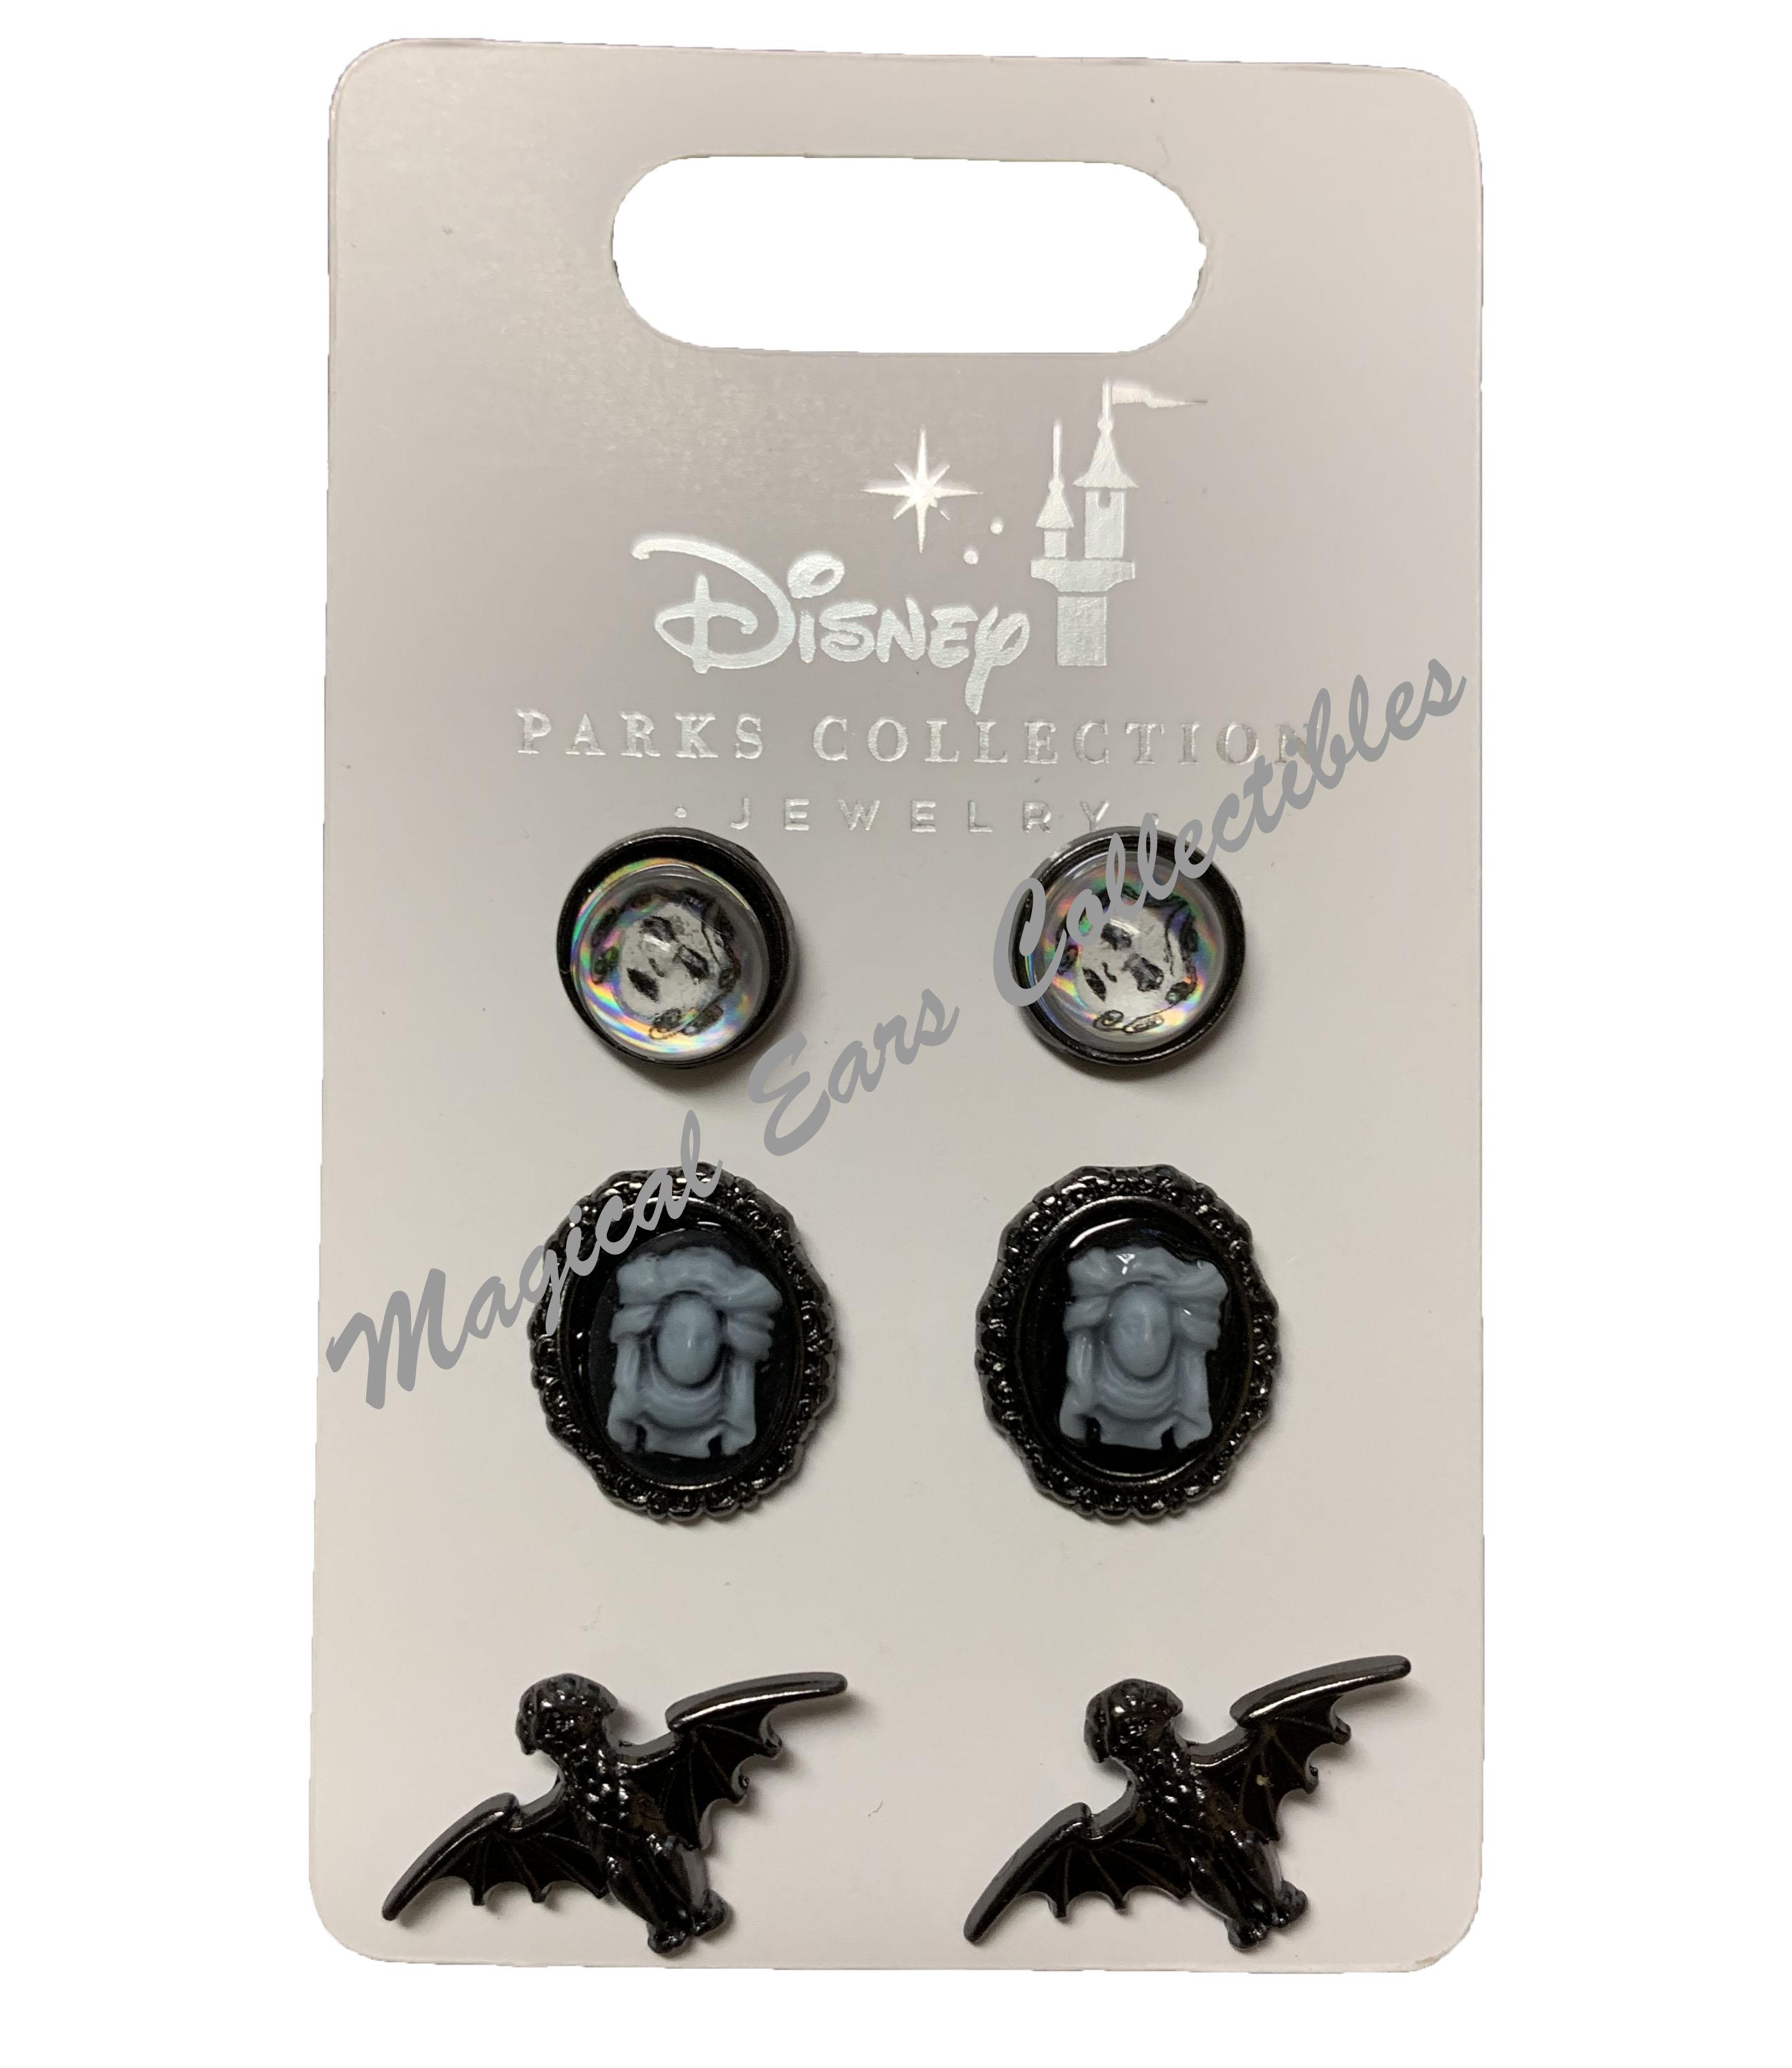 Haunted Mansion Butler Bottle Cap Earrings